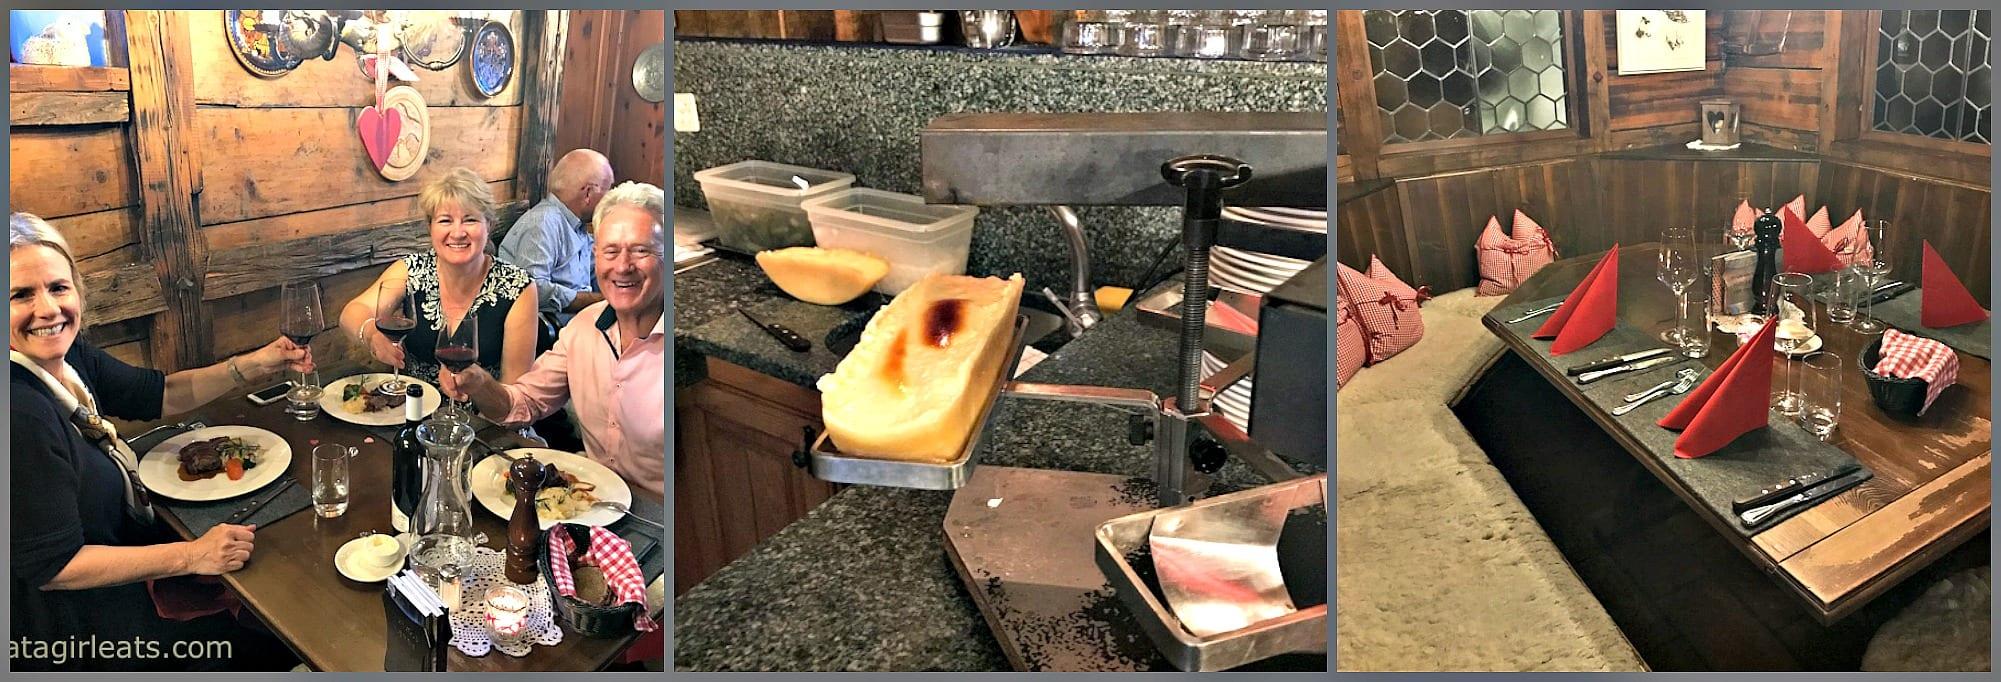 Schaferstube restaurant collage raclette and booths